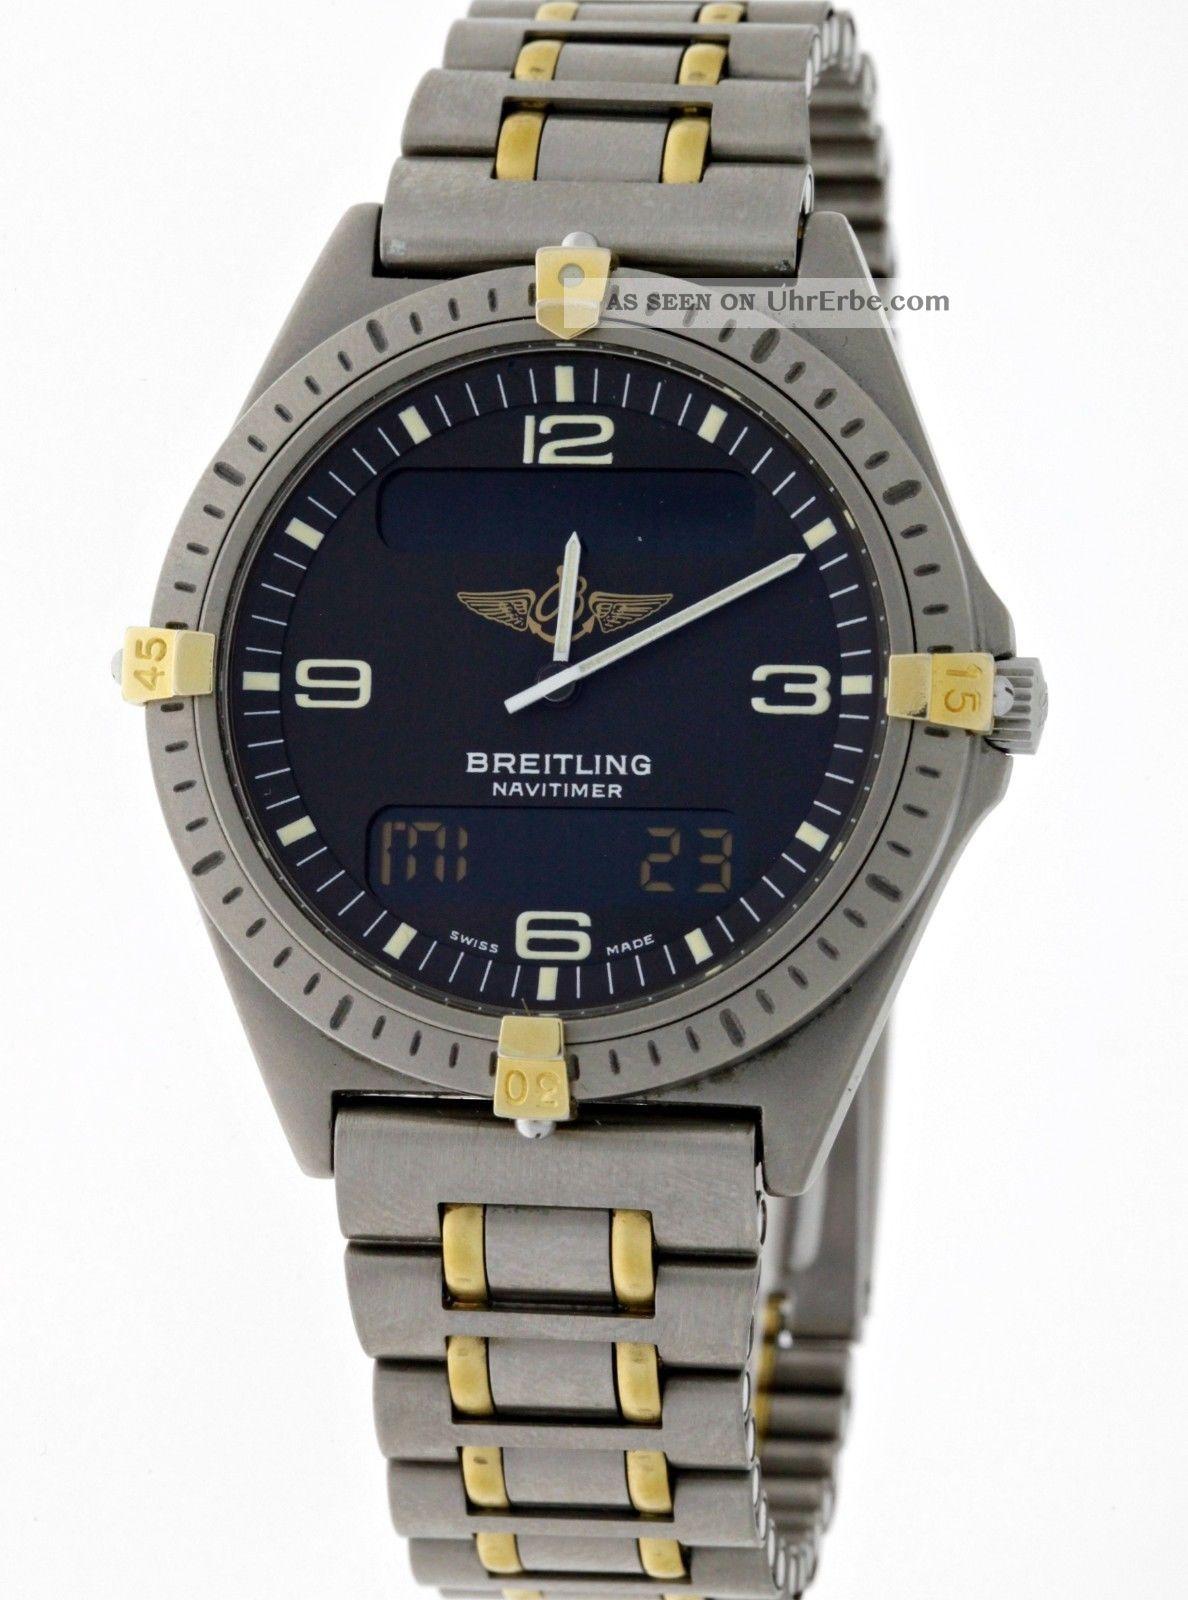 Breitling Navitimer Aerospace Ref.  F56059 Professional Titan/gold - Box&papiere Armbanduhren Bild